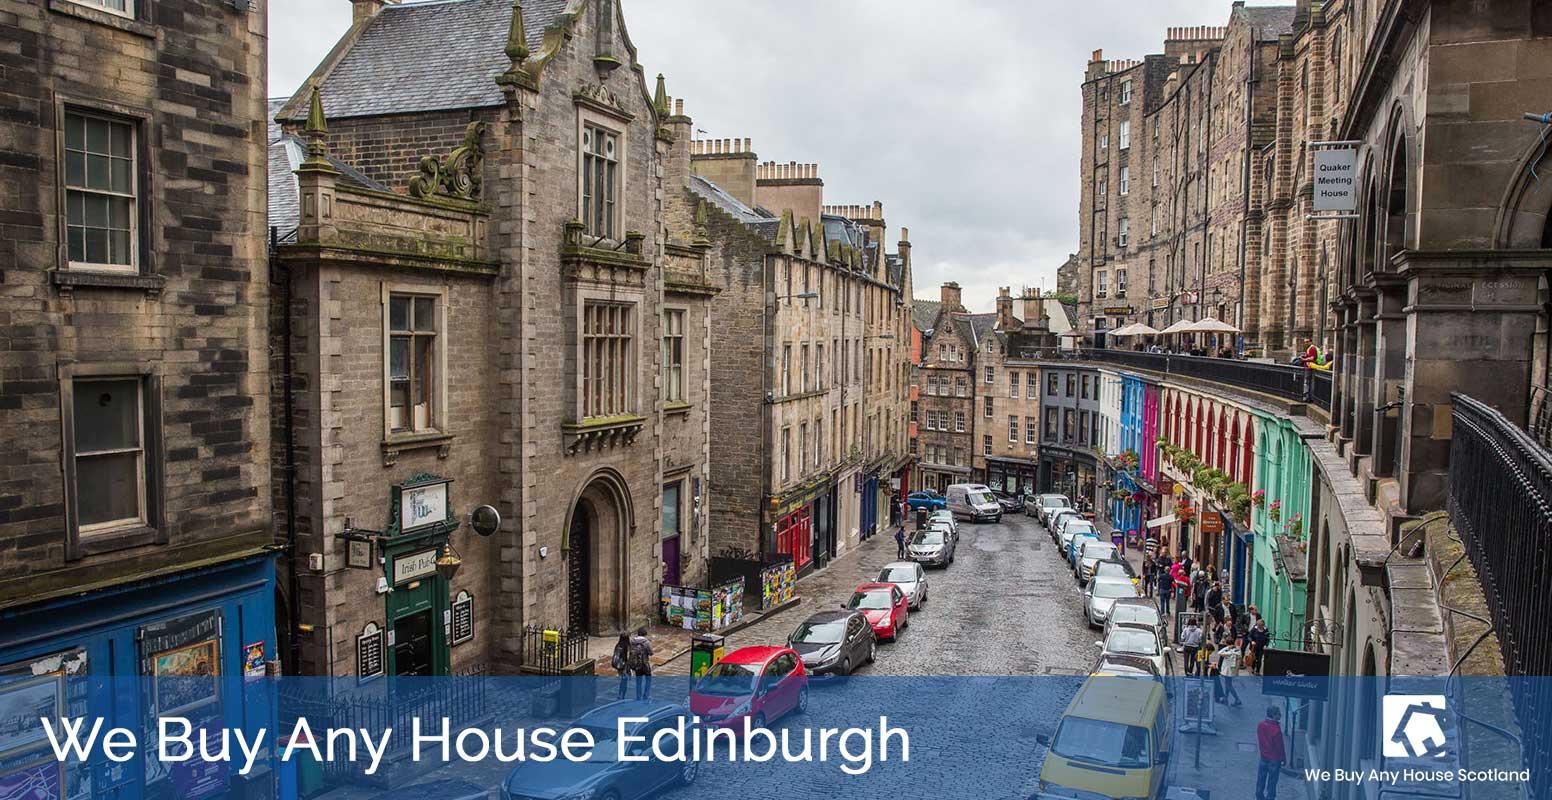 We Buy Any House Edinburgh